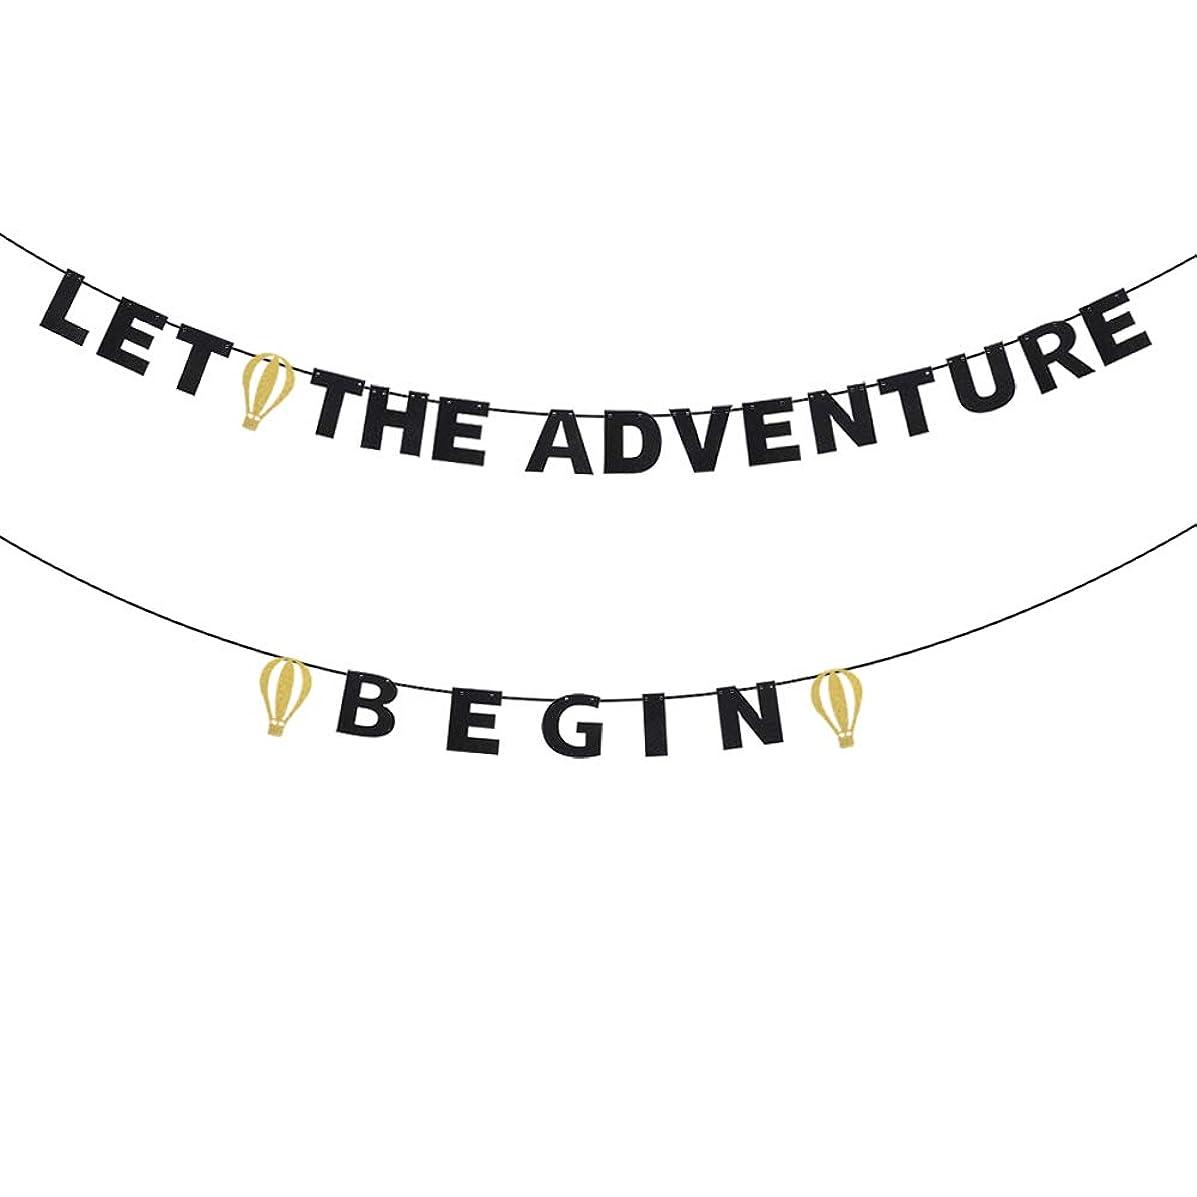 Let The Adventure Begin Banner - Glitter Hot Air Balloon Travel Graduation Retirement Birthday Party Backdrop - Kids Nursery Classroom Home Hanging Decoration